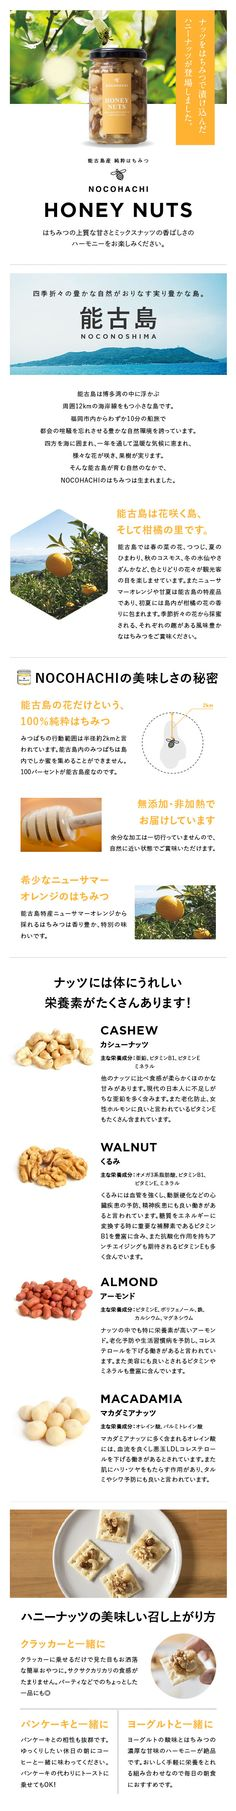 NOCOHACHI|HONEY NUTS ランディングページ|kacika制作実績 Honey, Design